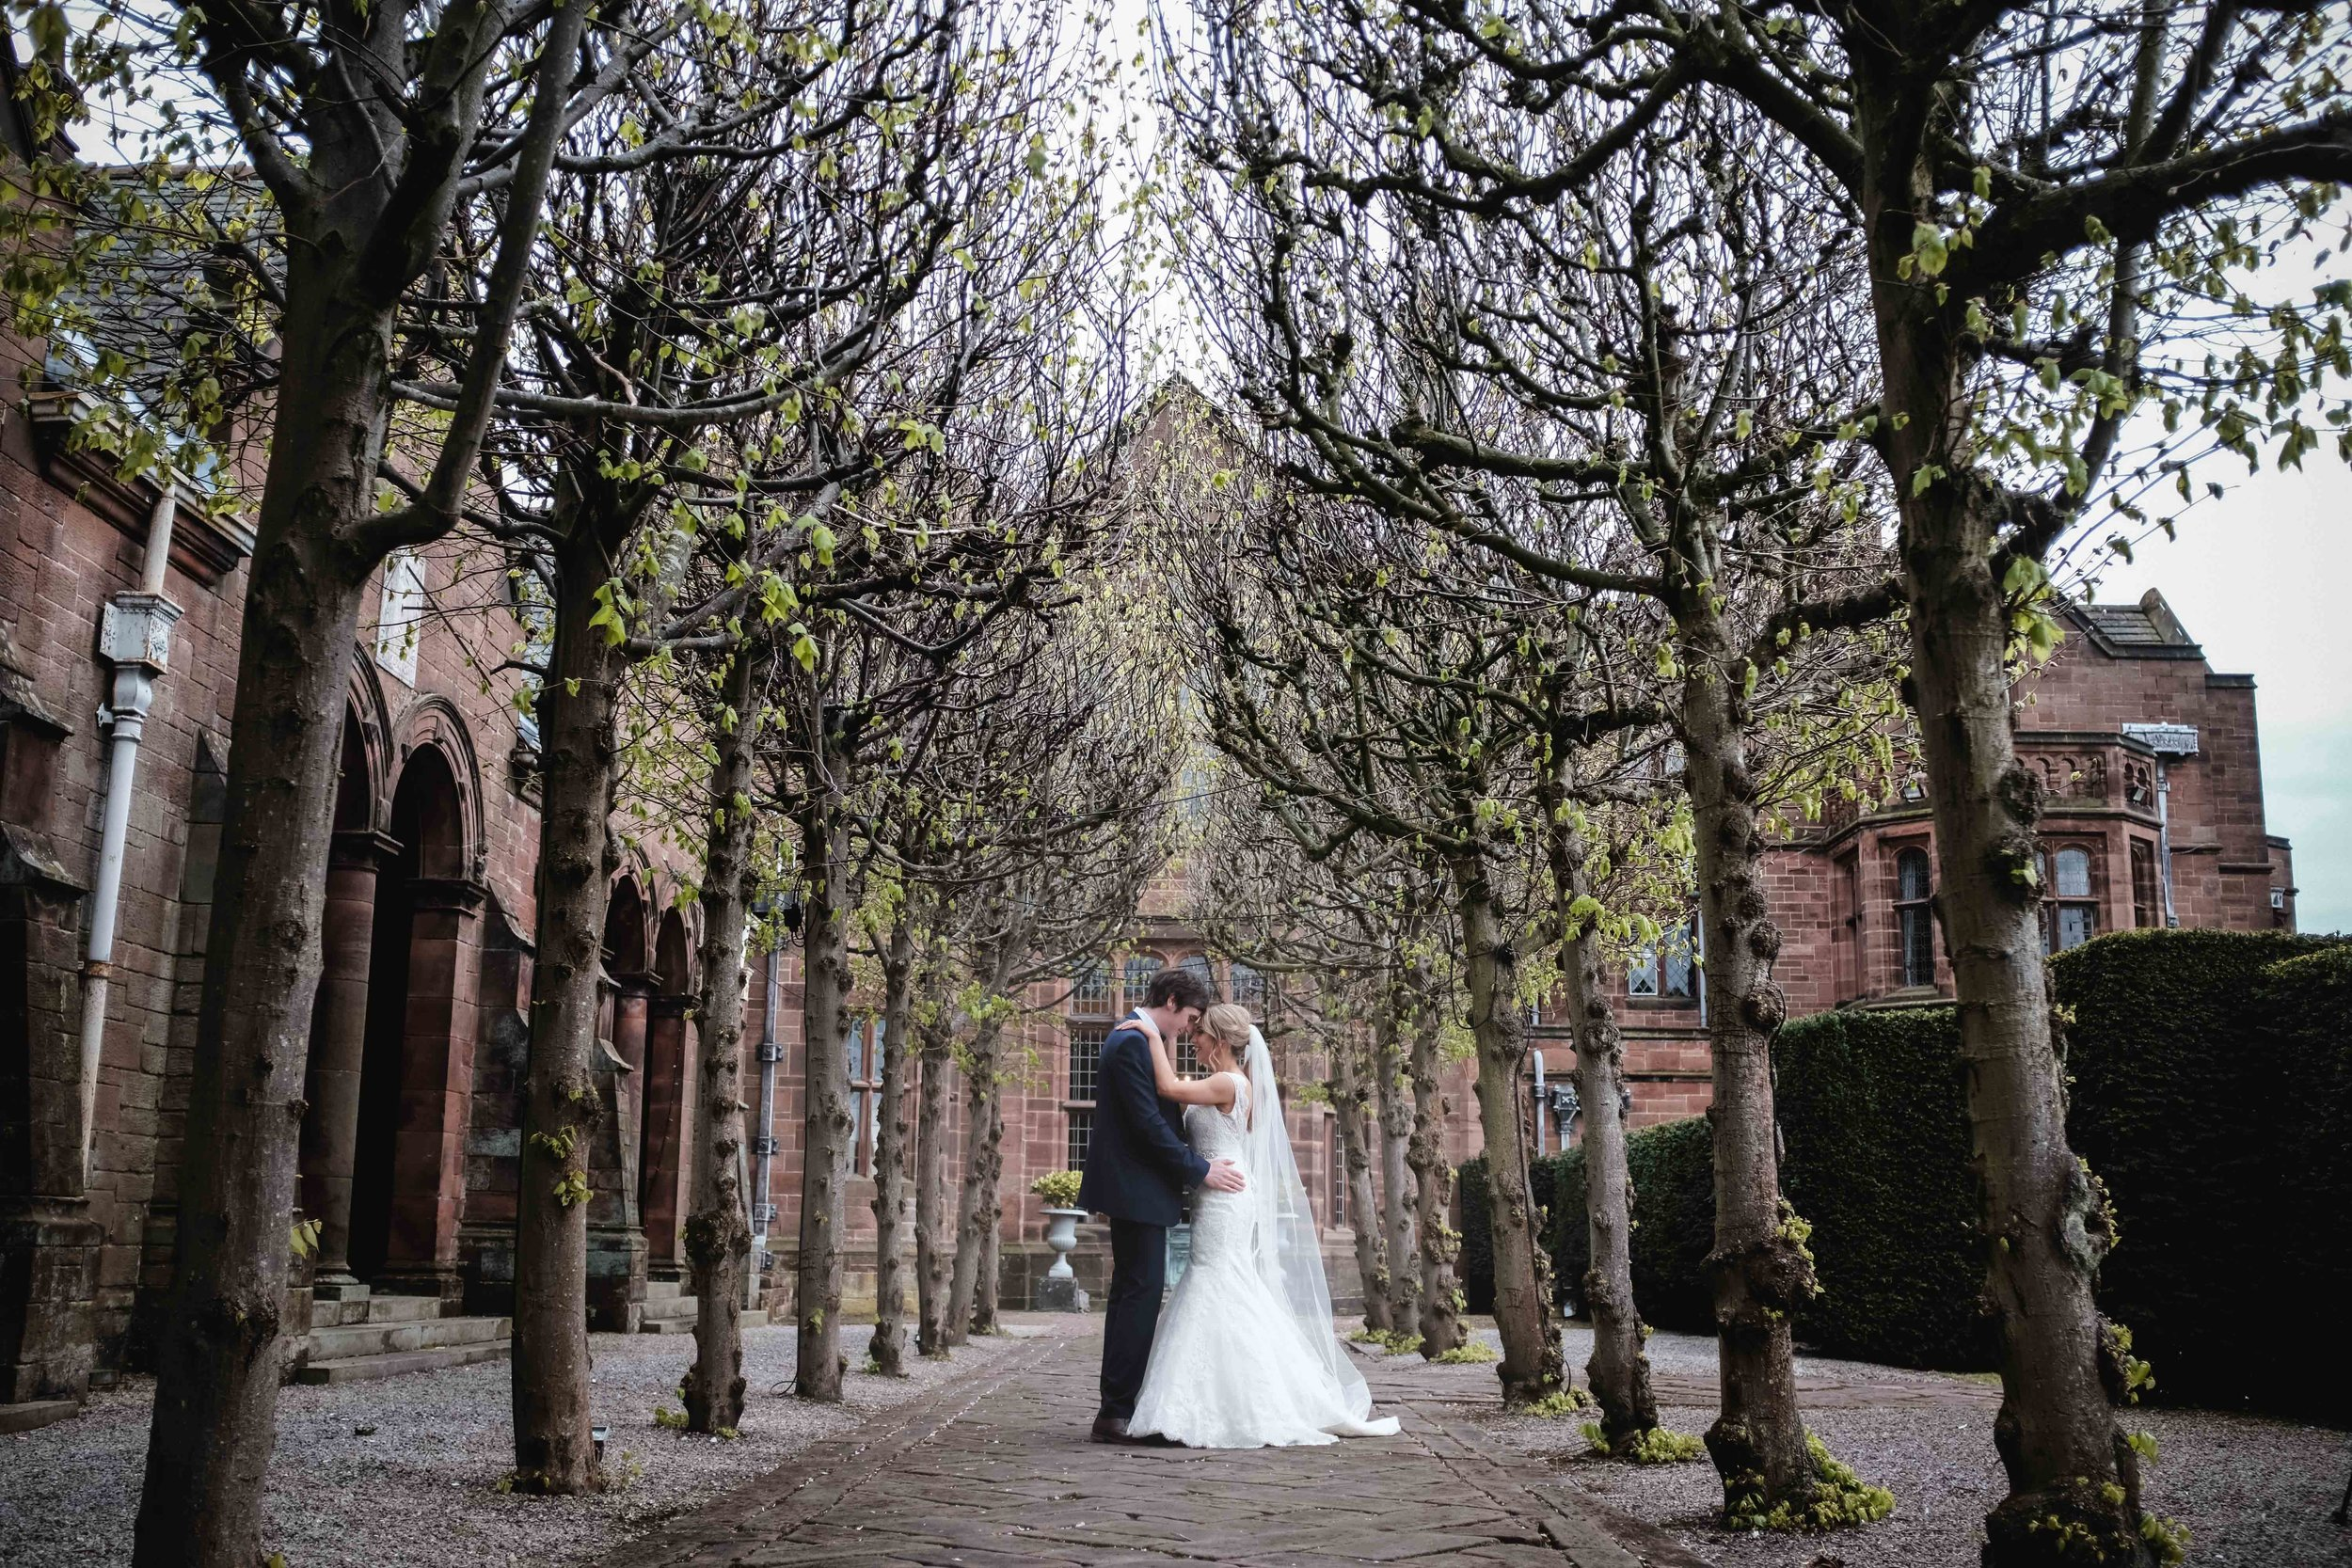 Thornton manor wedding photography cheshire wedding photographer liverpool manchester warrington chester wirral wedding BLOG (78 of 108).jpg